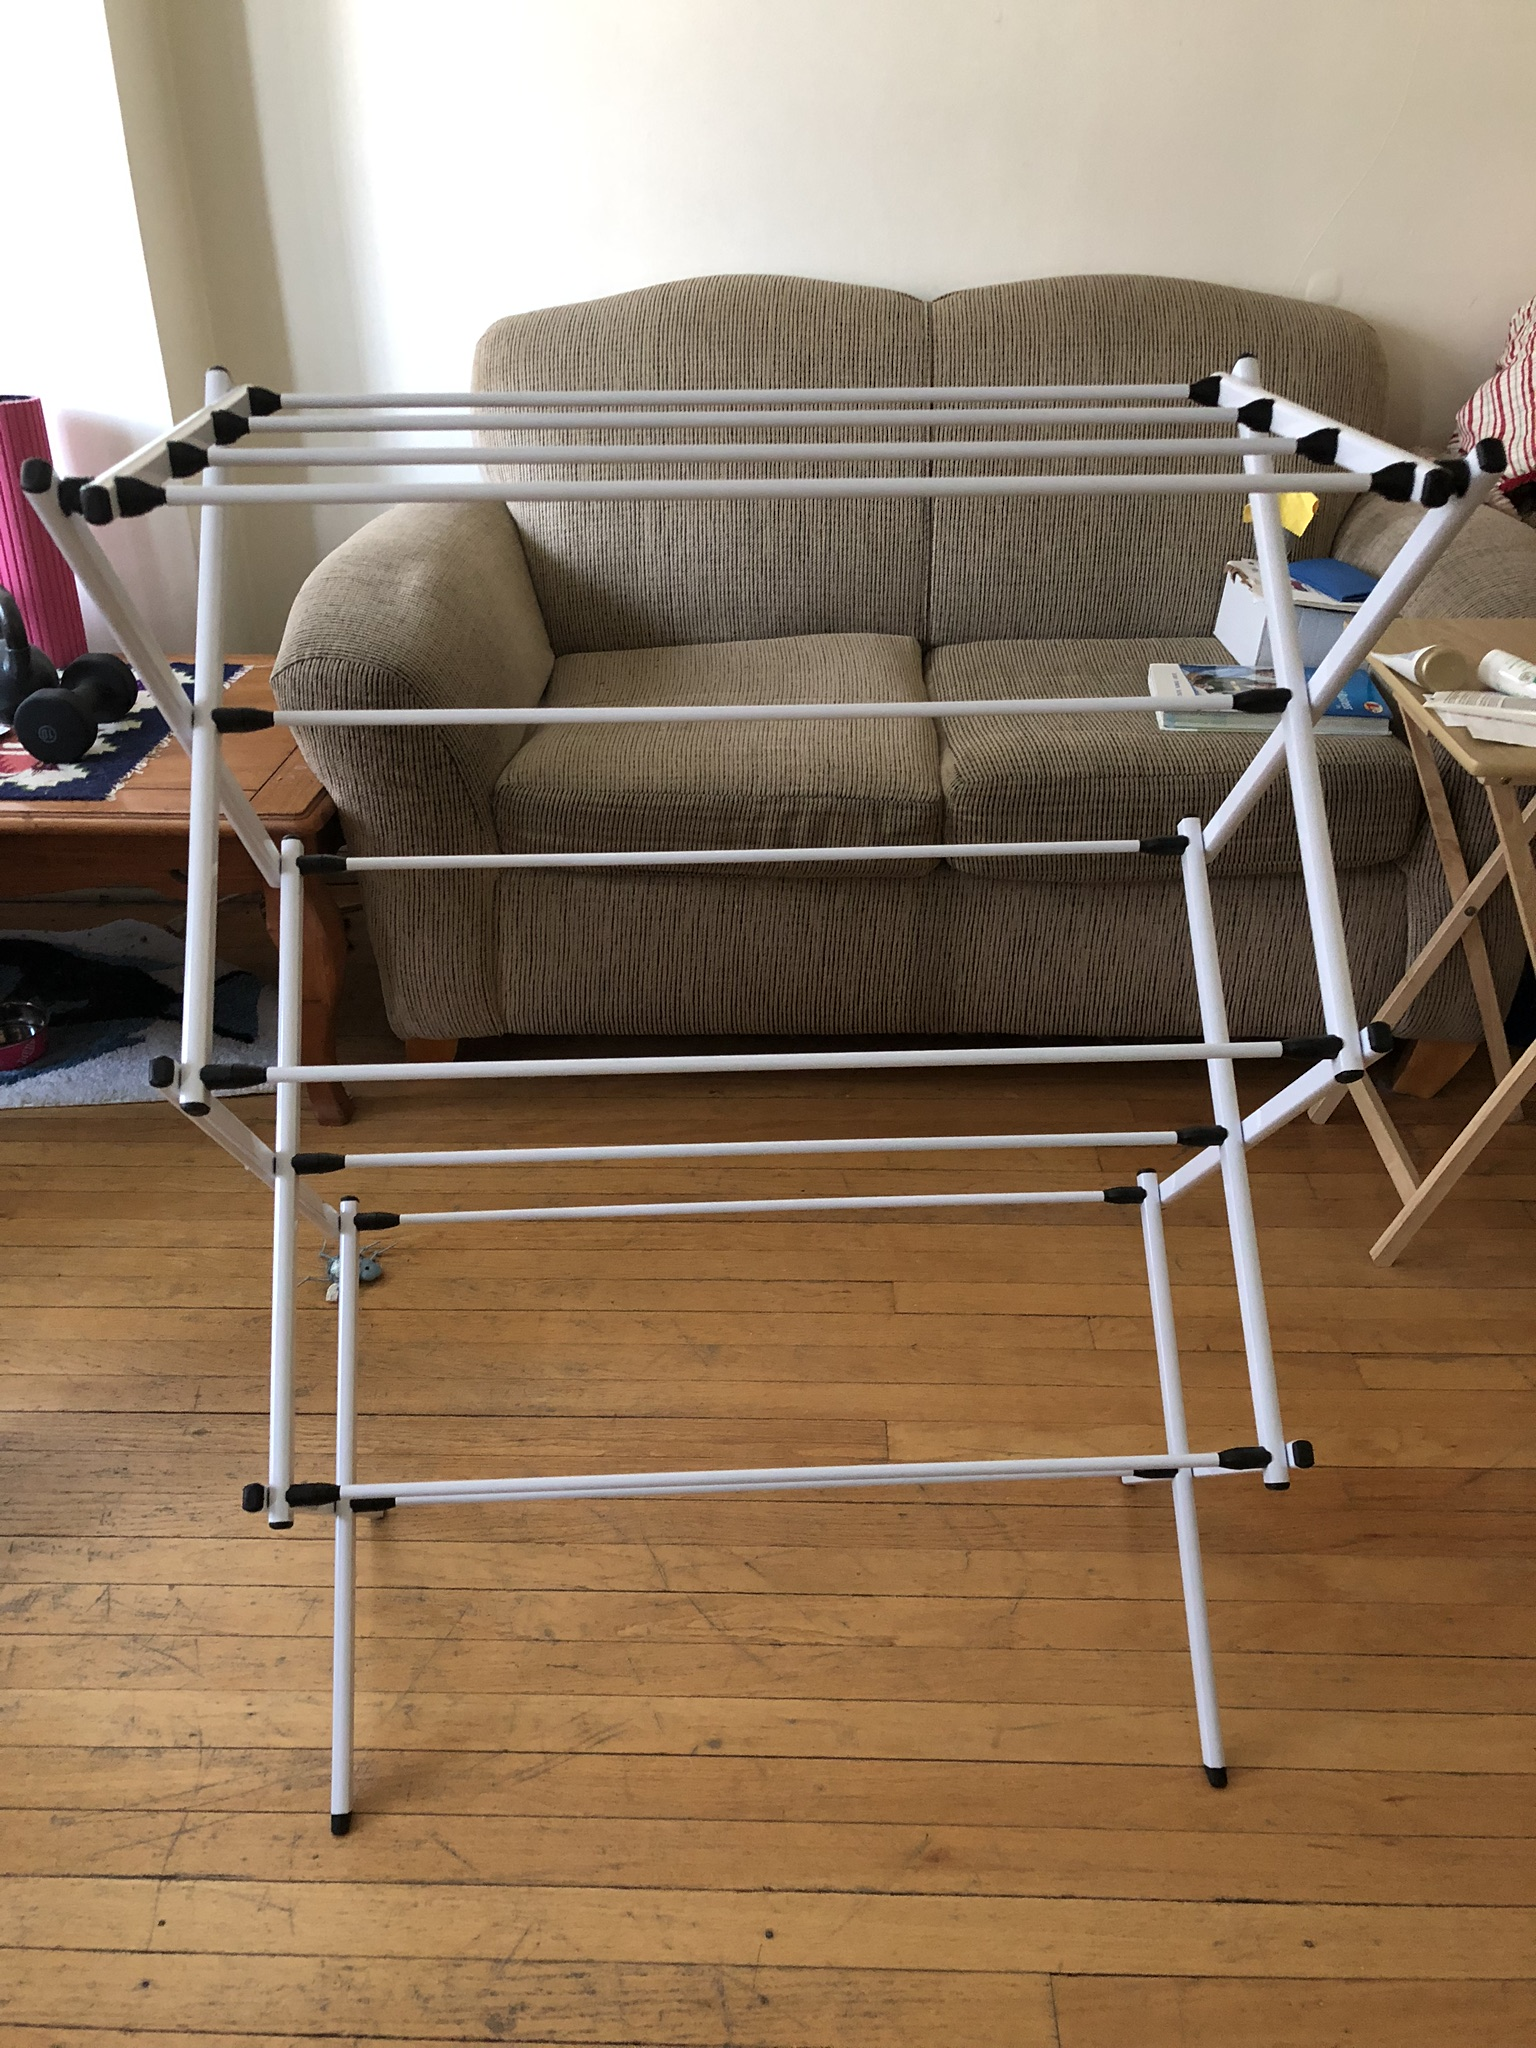 Drying rack-1